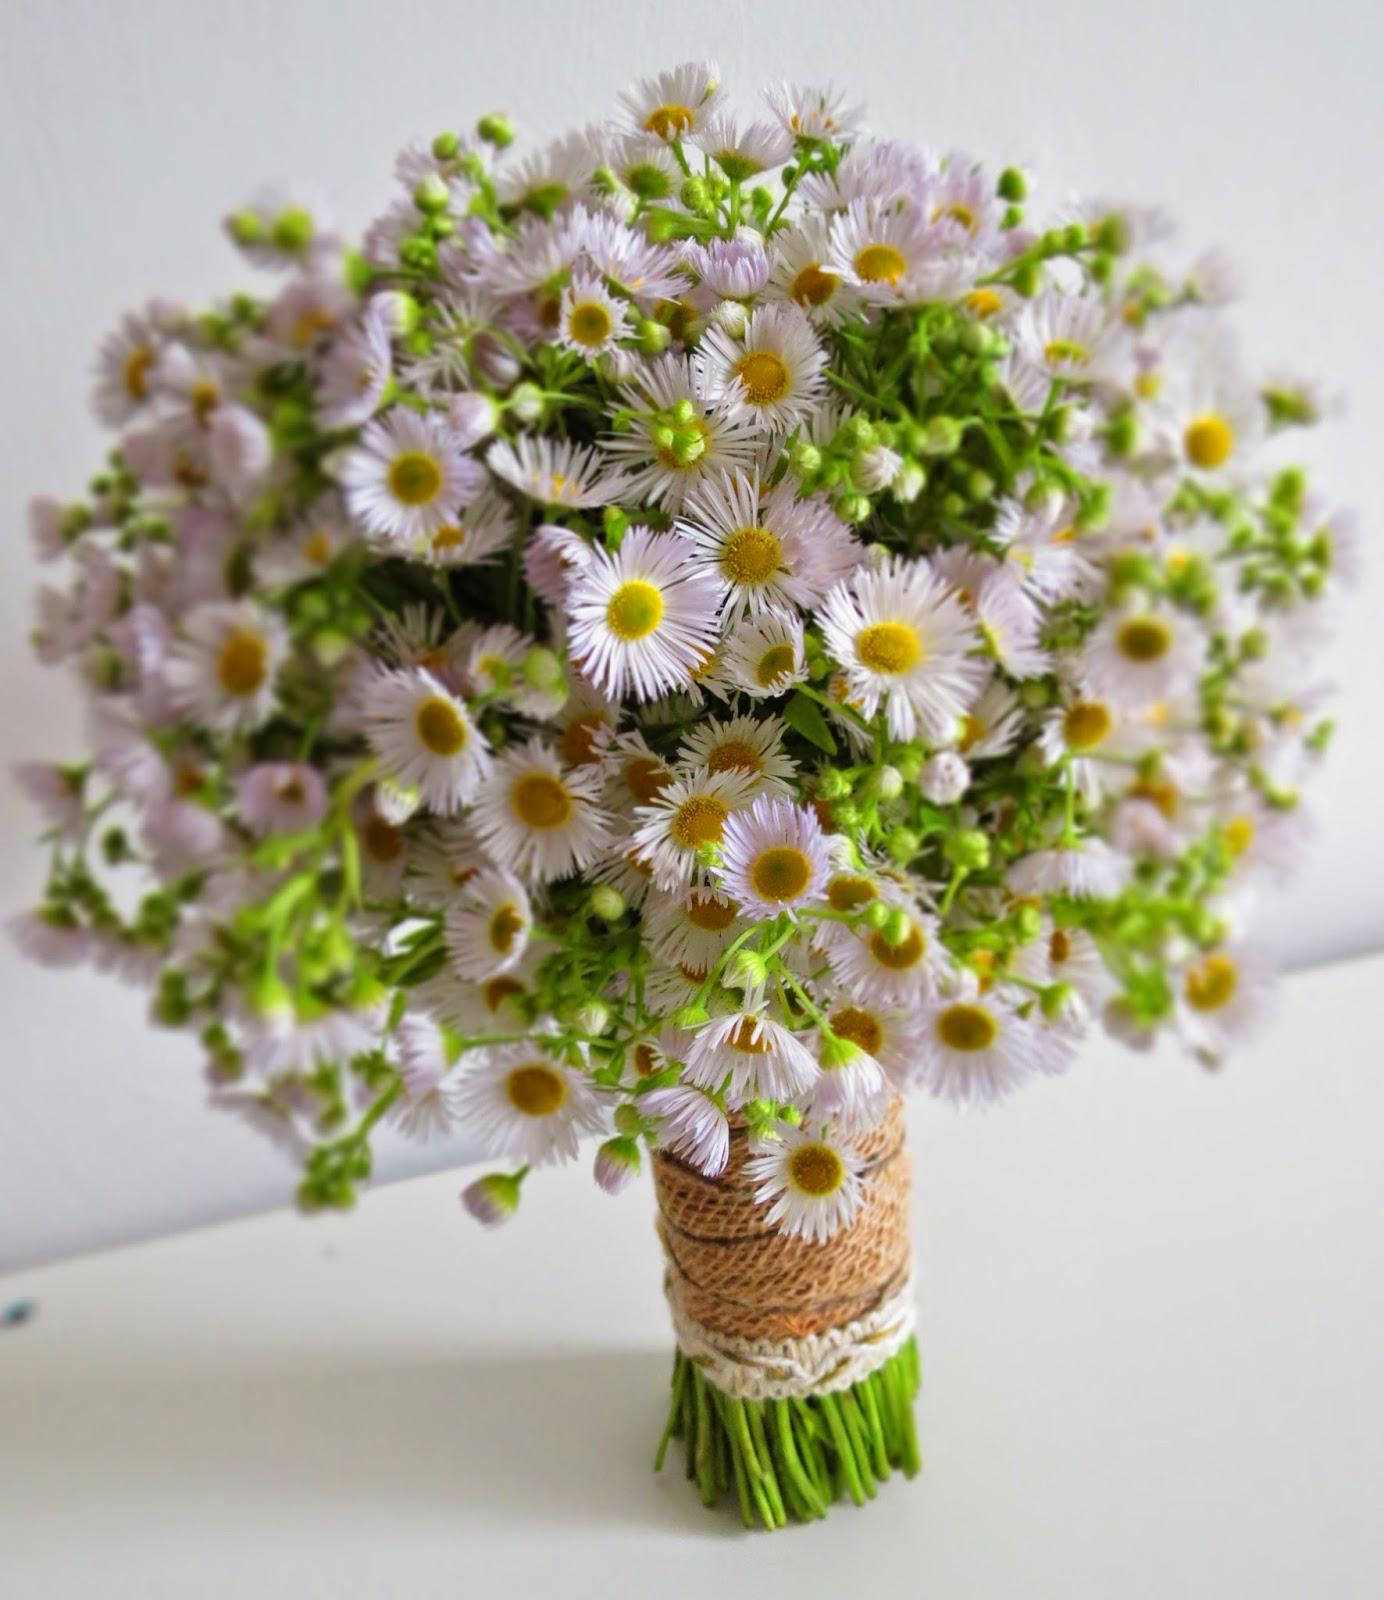 Bridal Flower Plants : Aster wedding flowers ideas